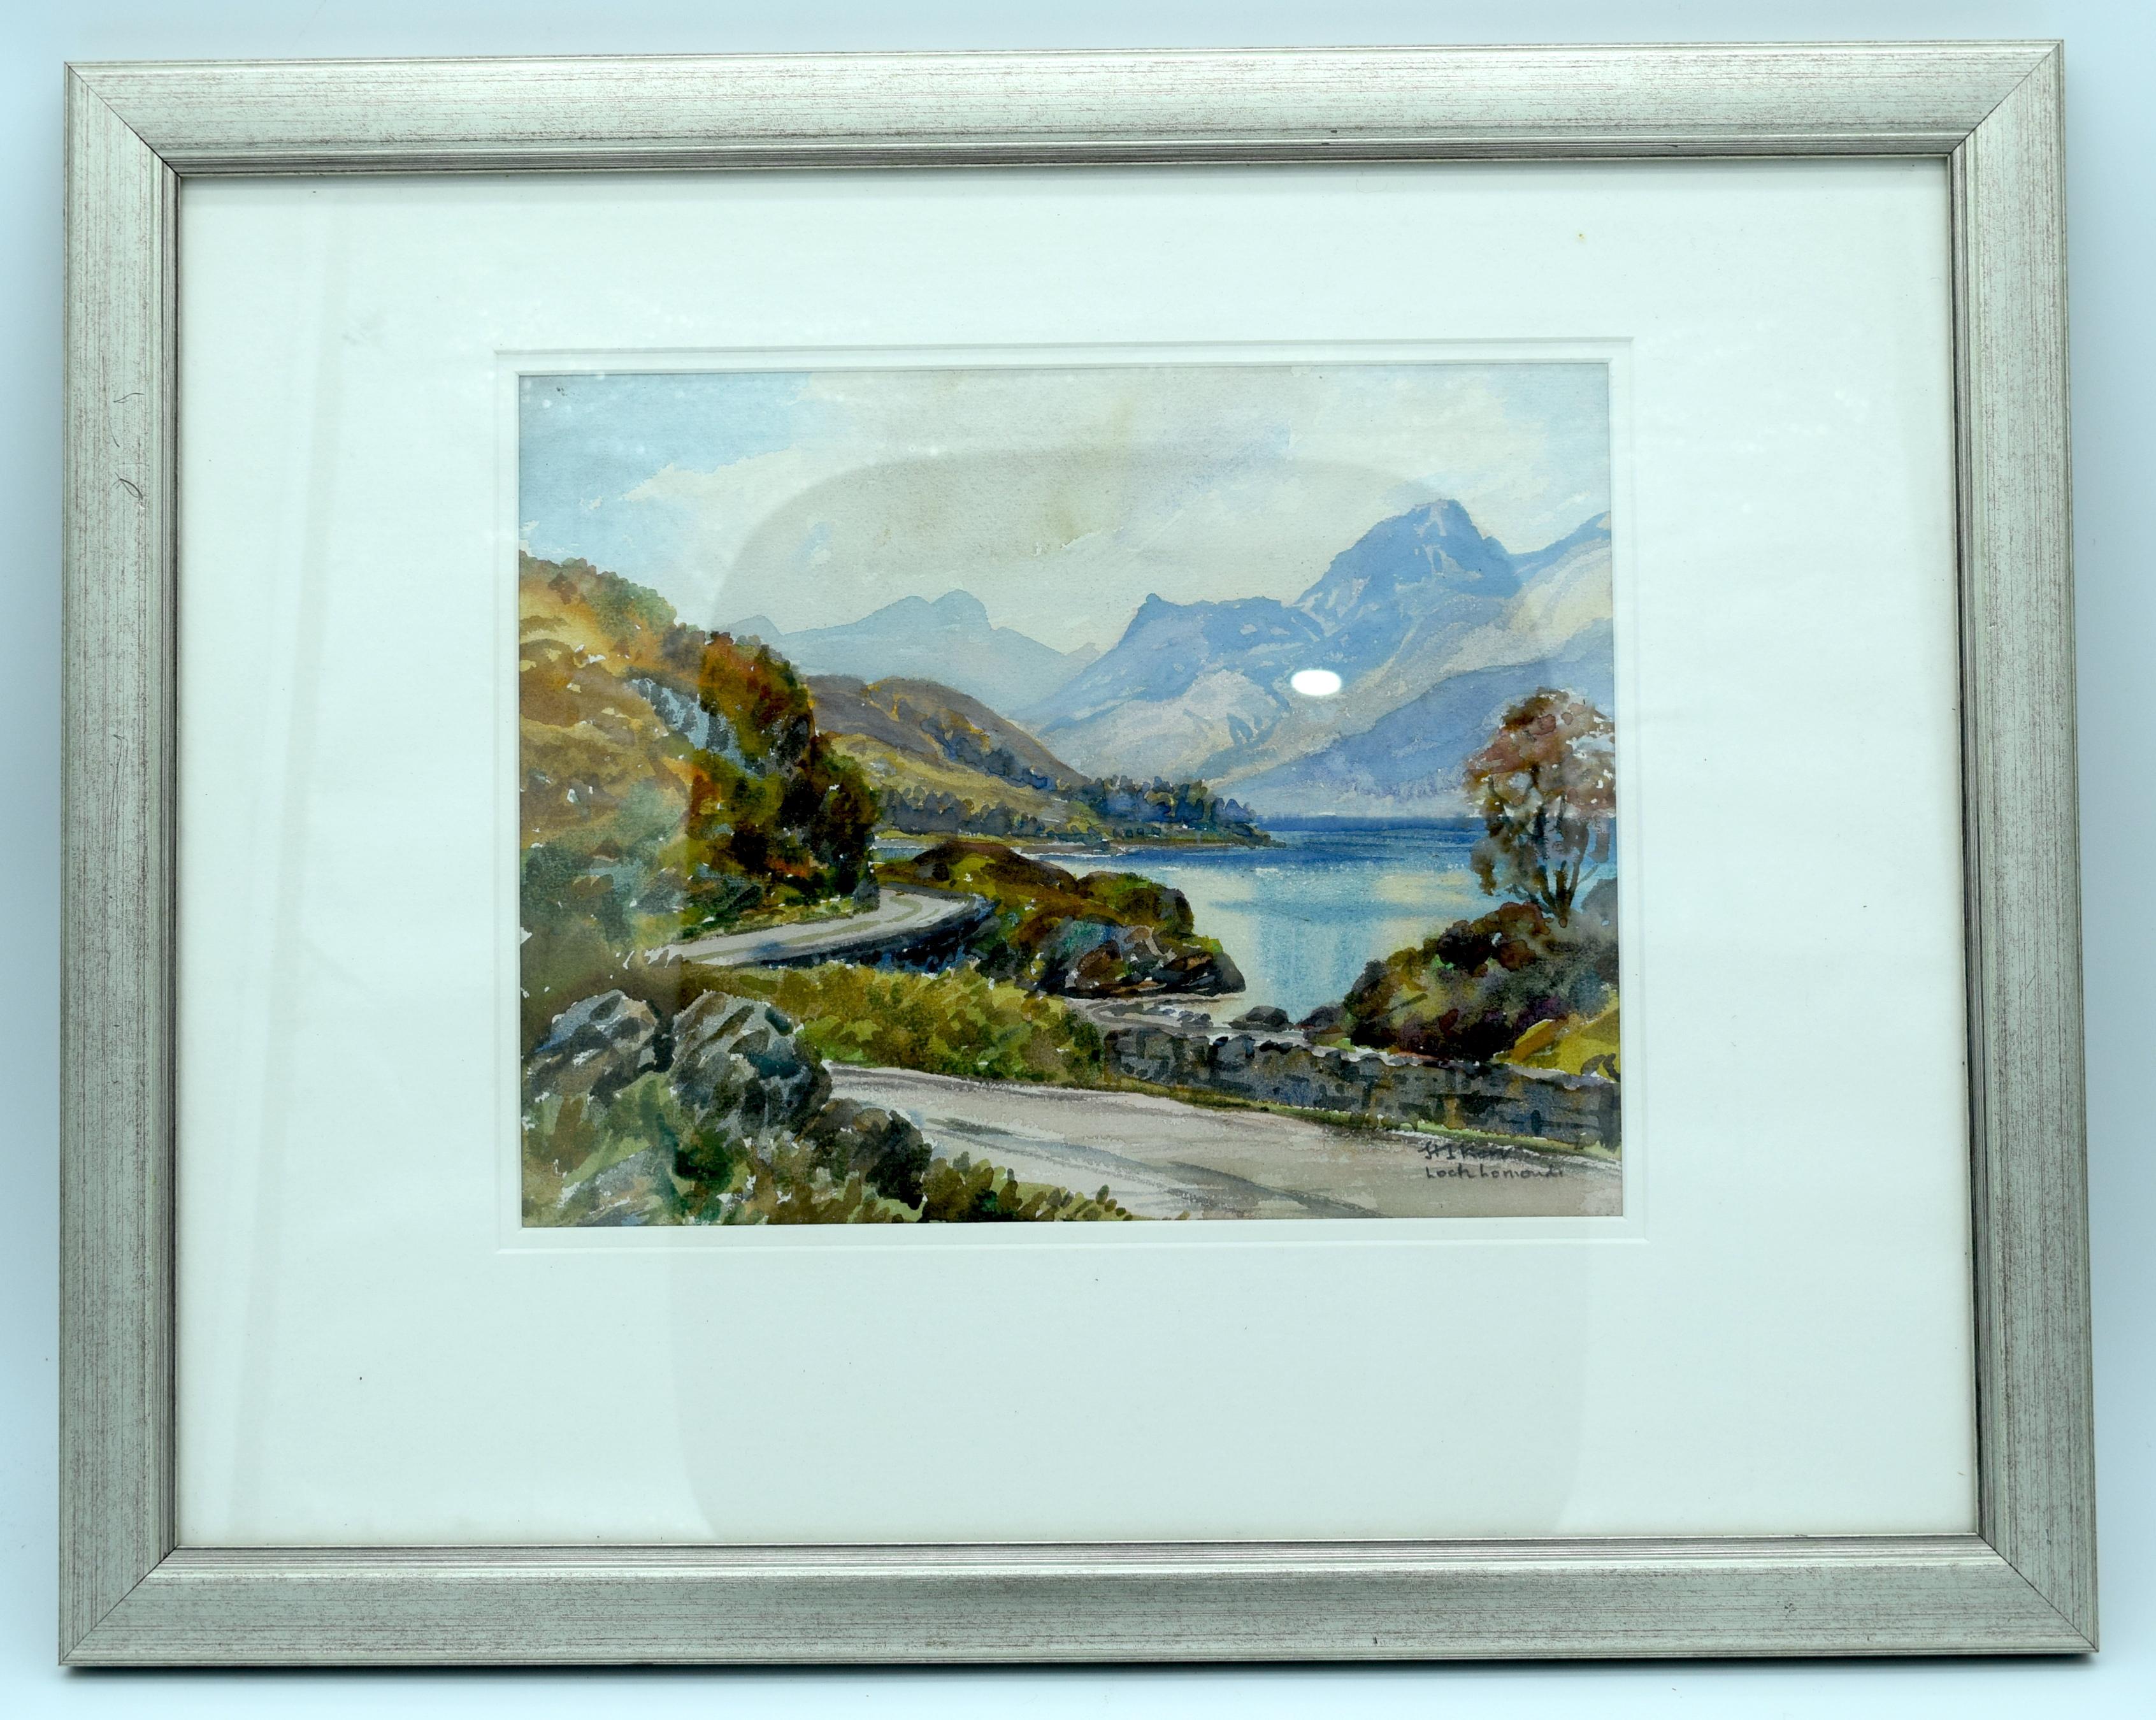 Framed watercolour of Loch Lomond 21 x 27.5 cm.